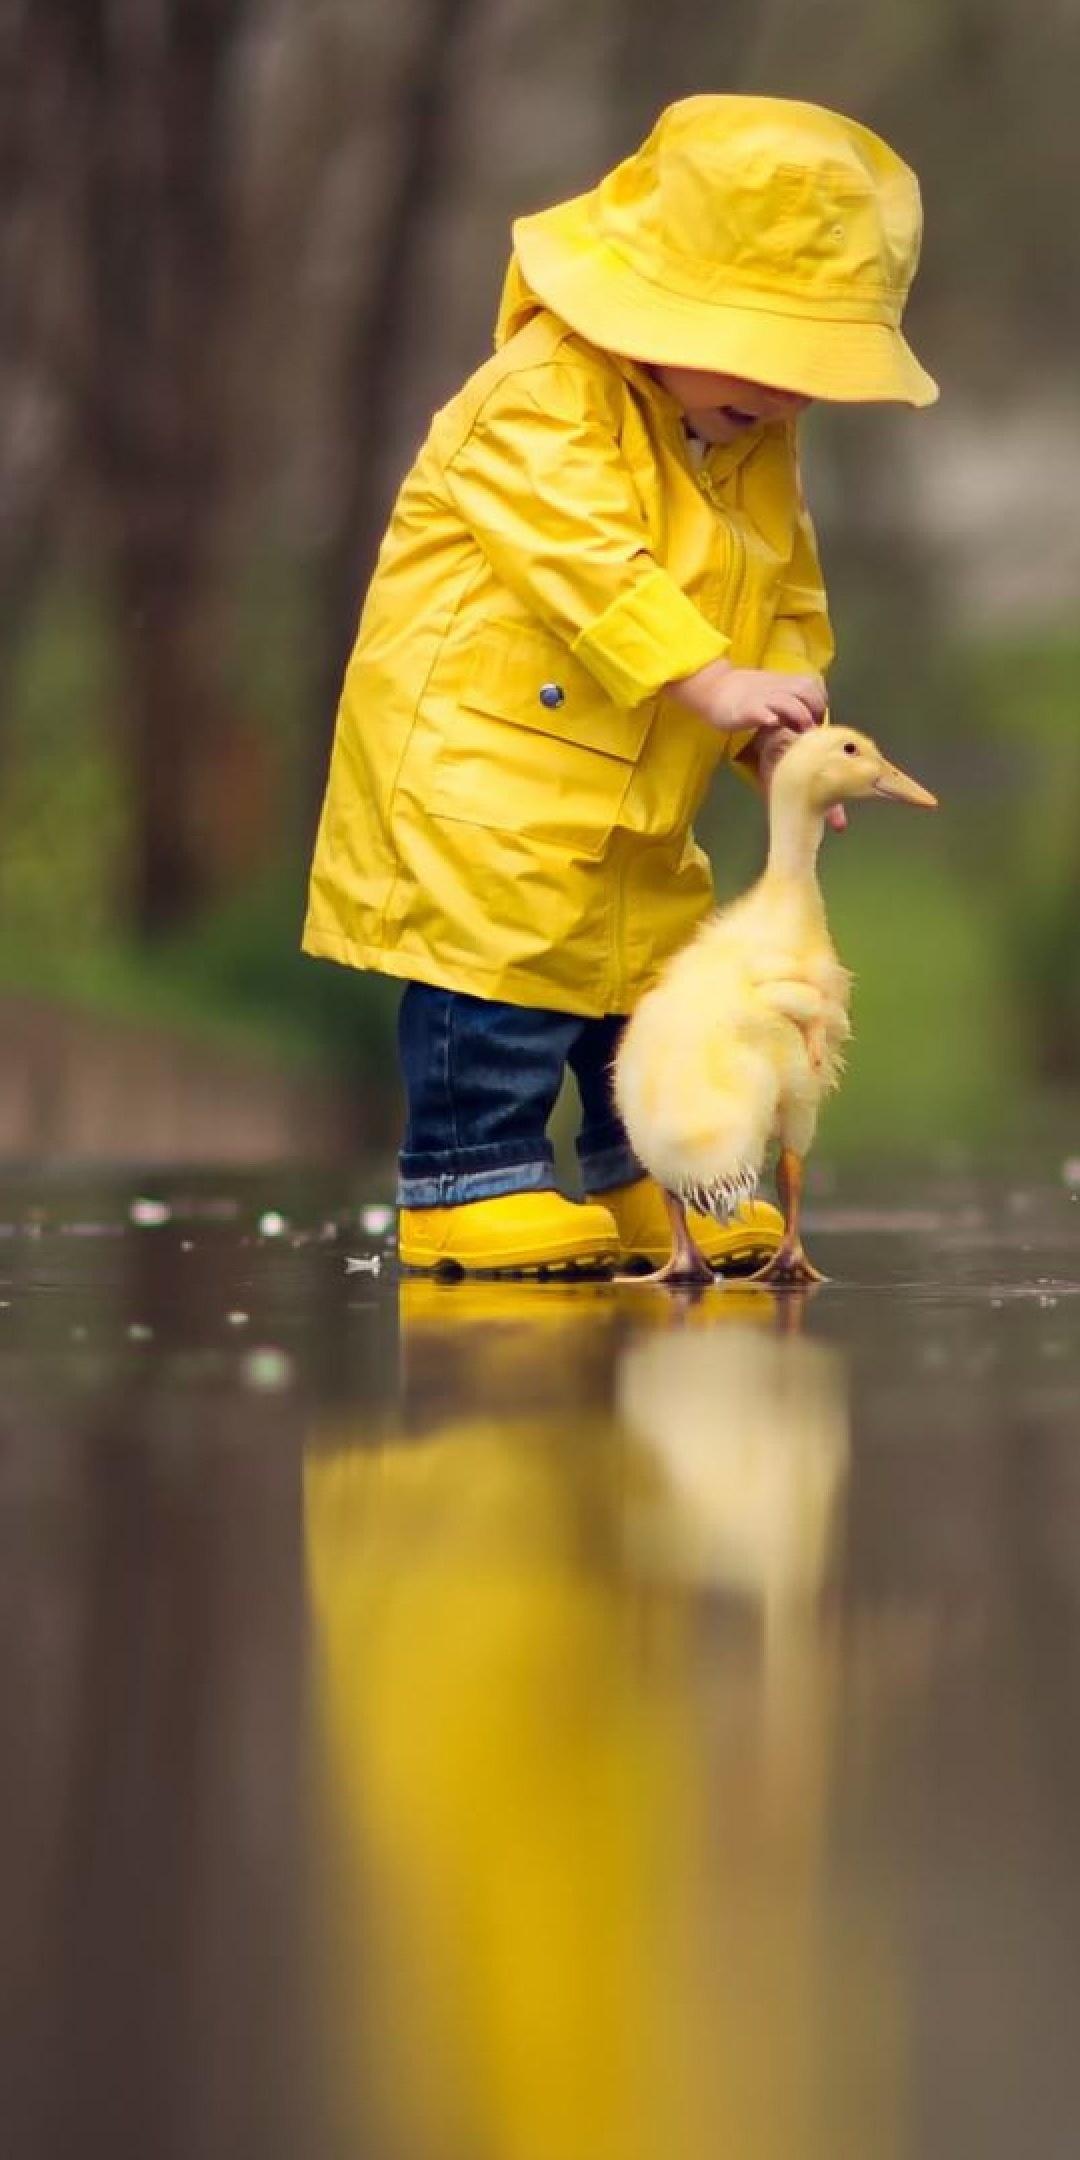 little-boy-child-playing-with-ducks-kv.jpg